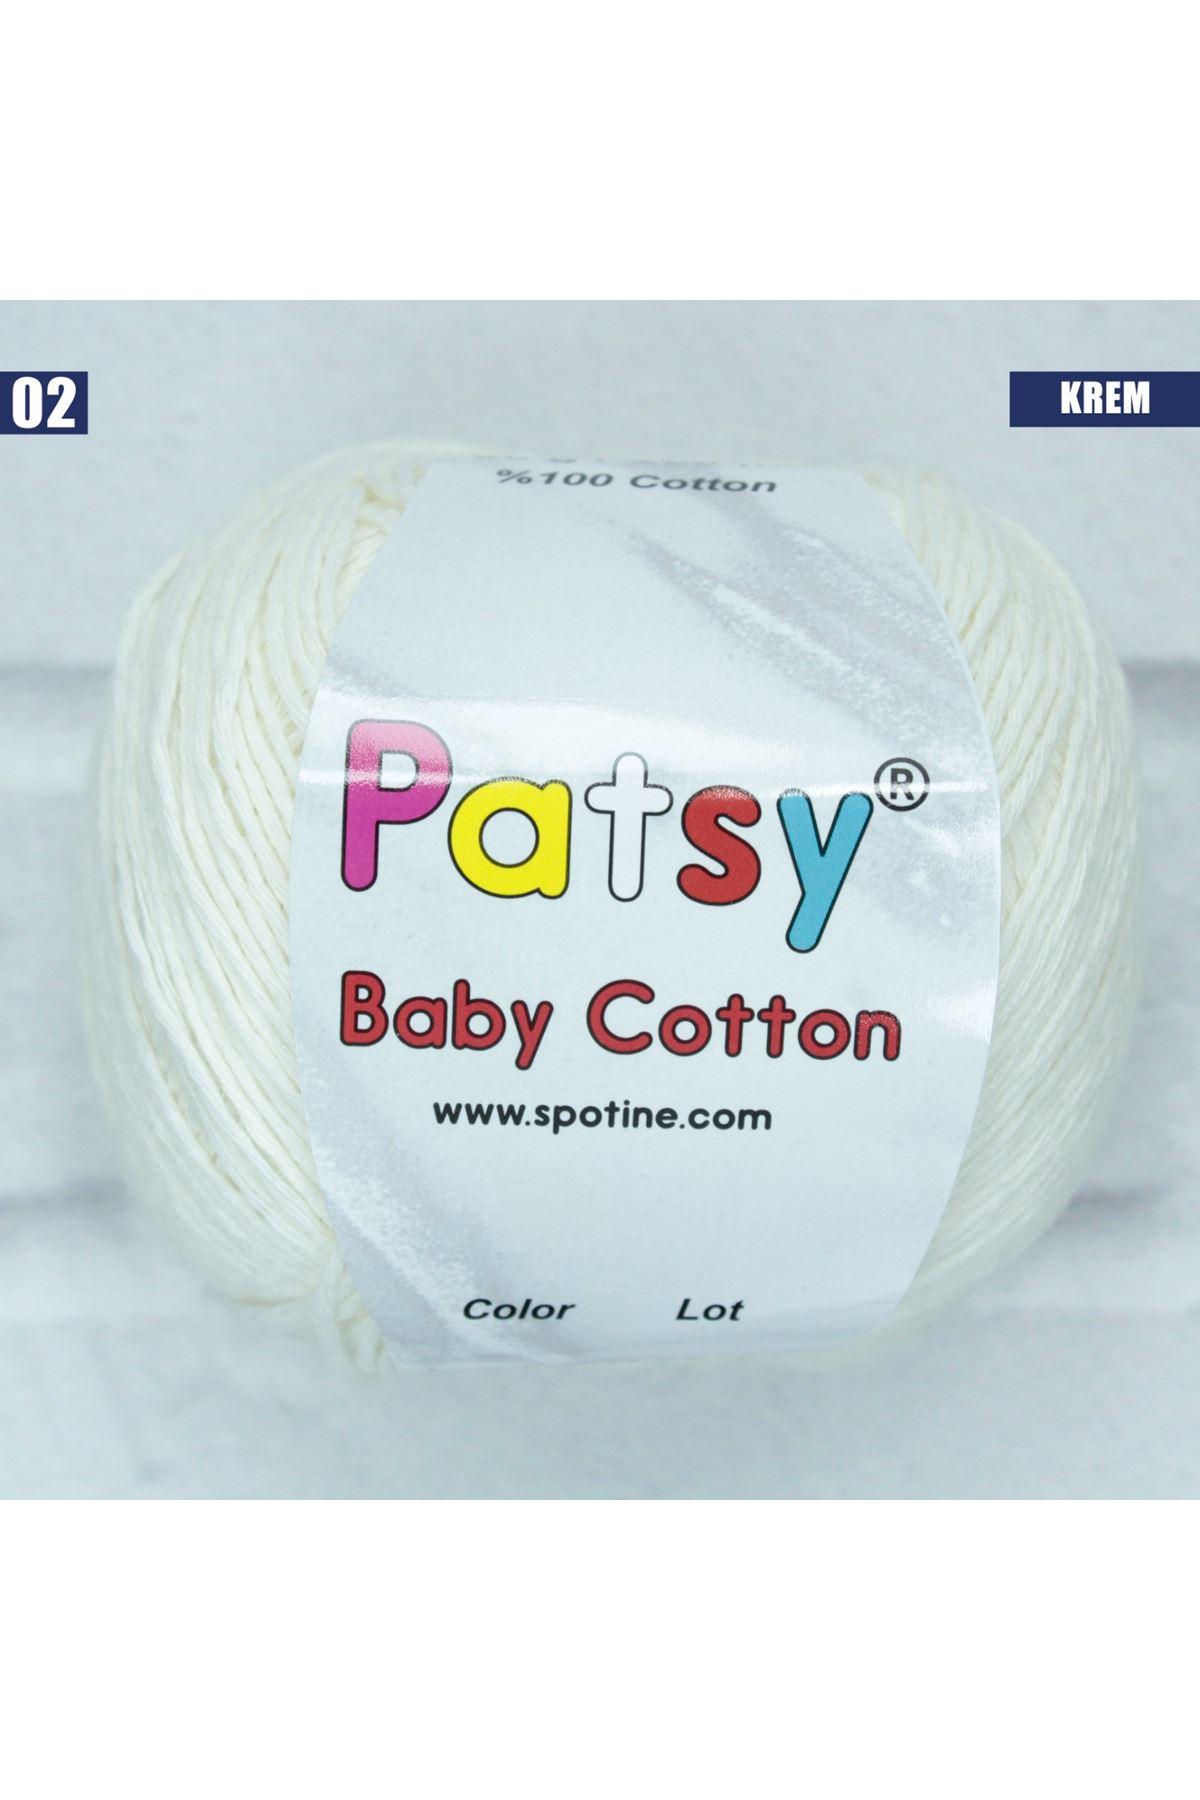 Patsy Baby Cotton 02 Krem